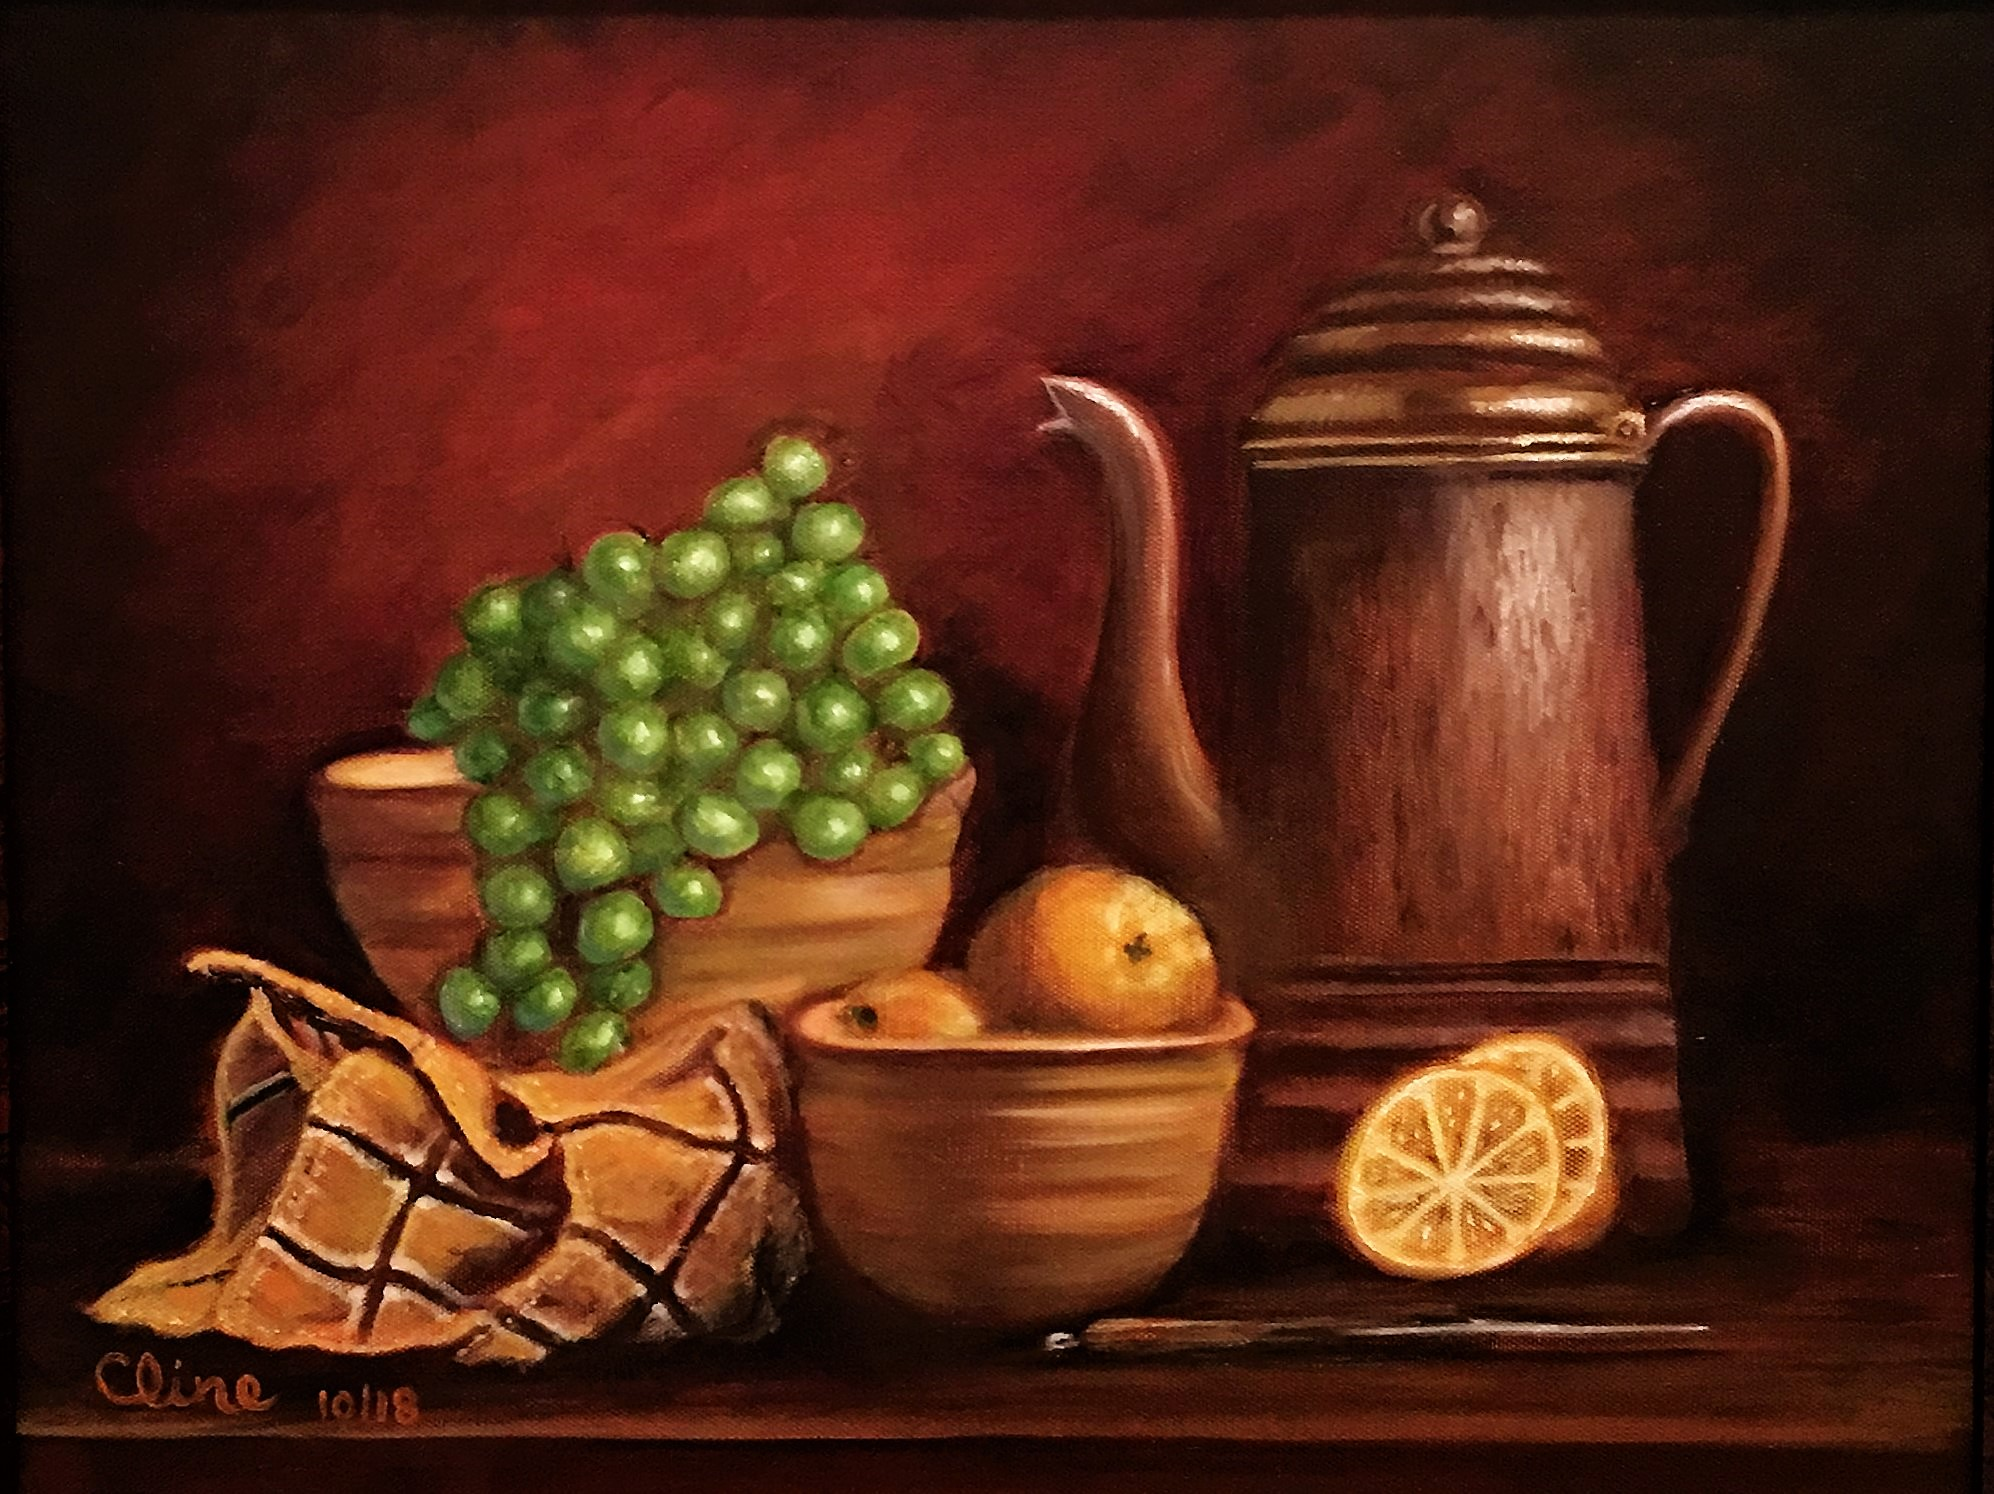 Coffee Pot with Lemons and Tea Towel -- mine 16x20.JPG